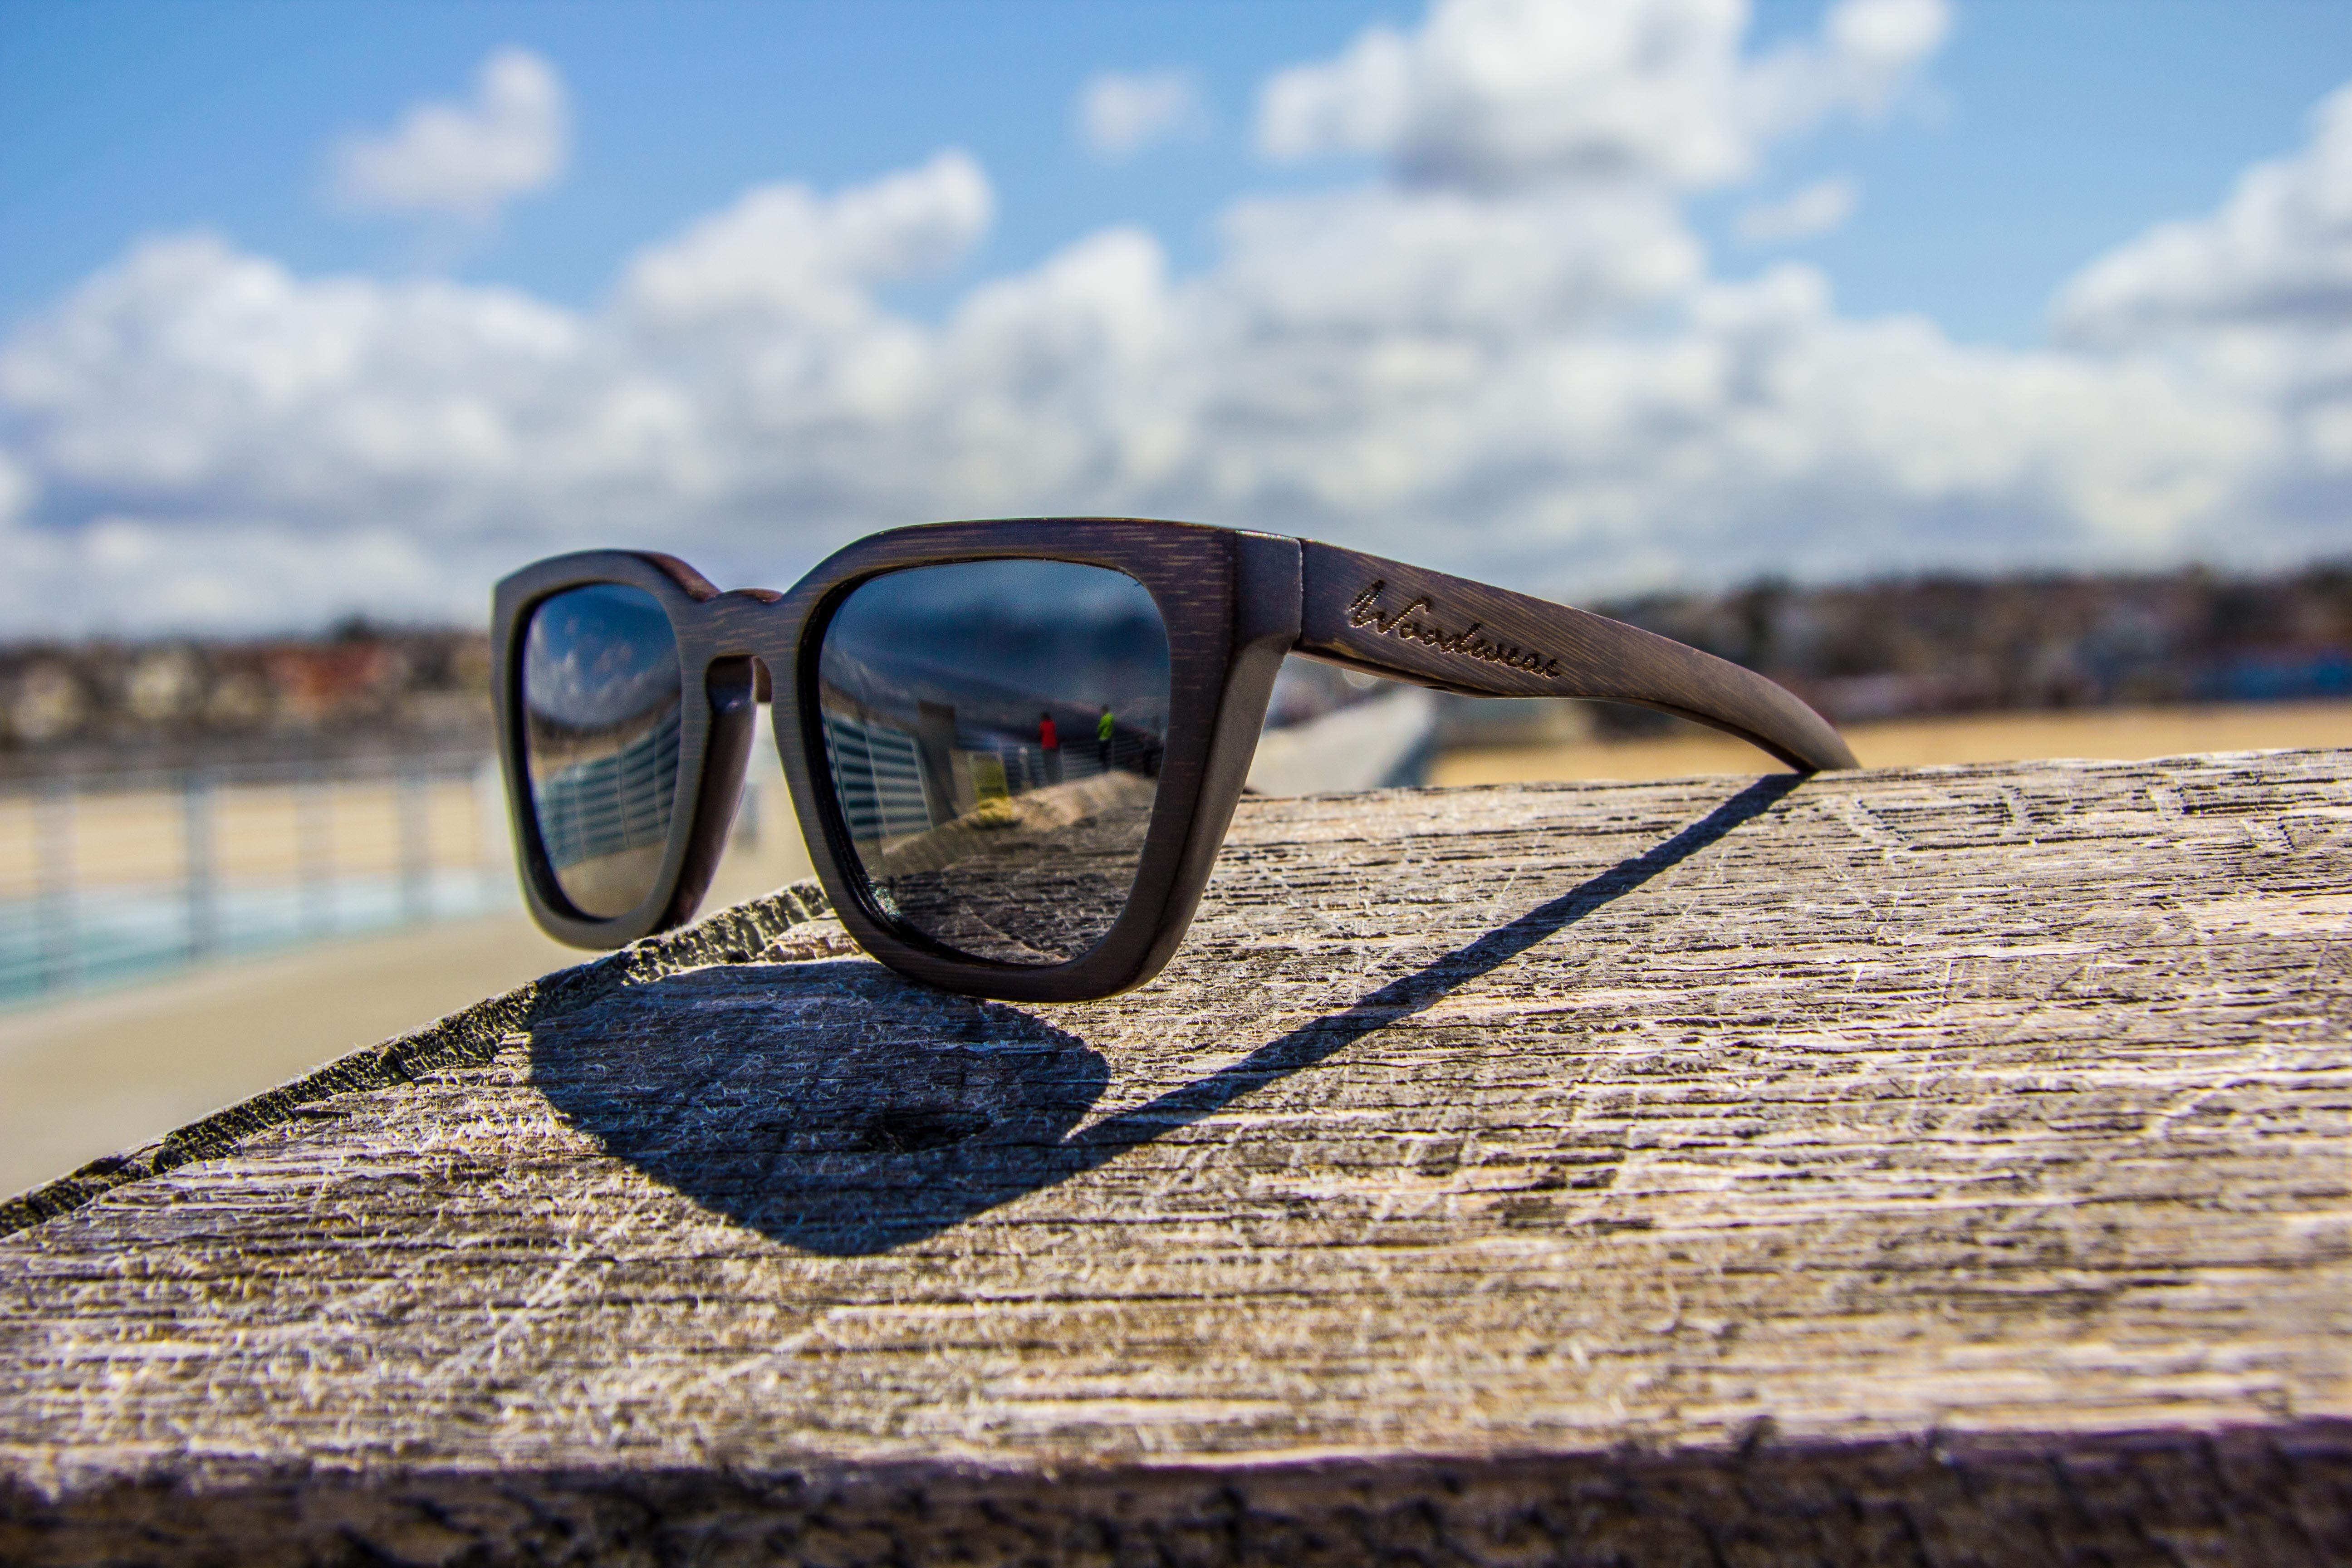 Woodwear Sunglasses - Venice bamboo sunglasses that float!    www.woodwearsunglasses.com